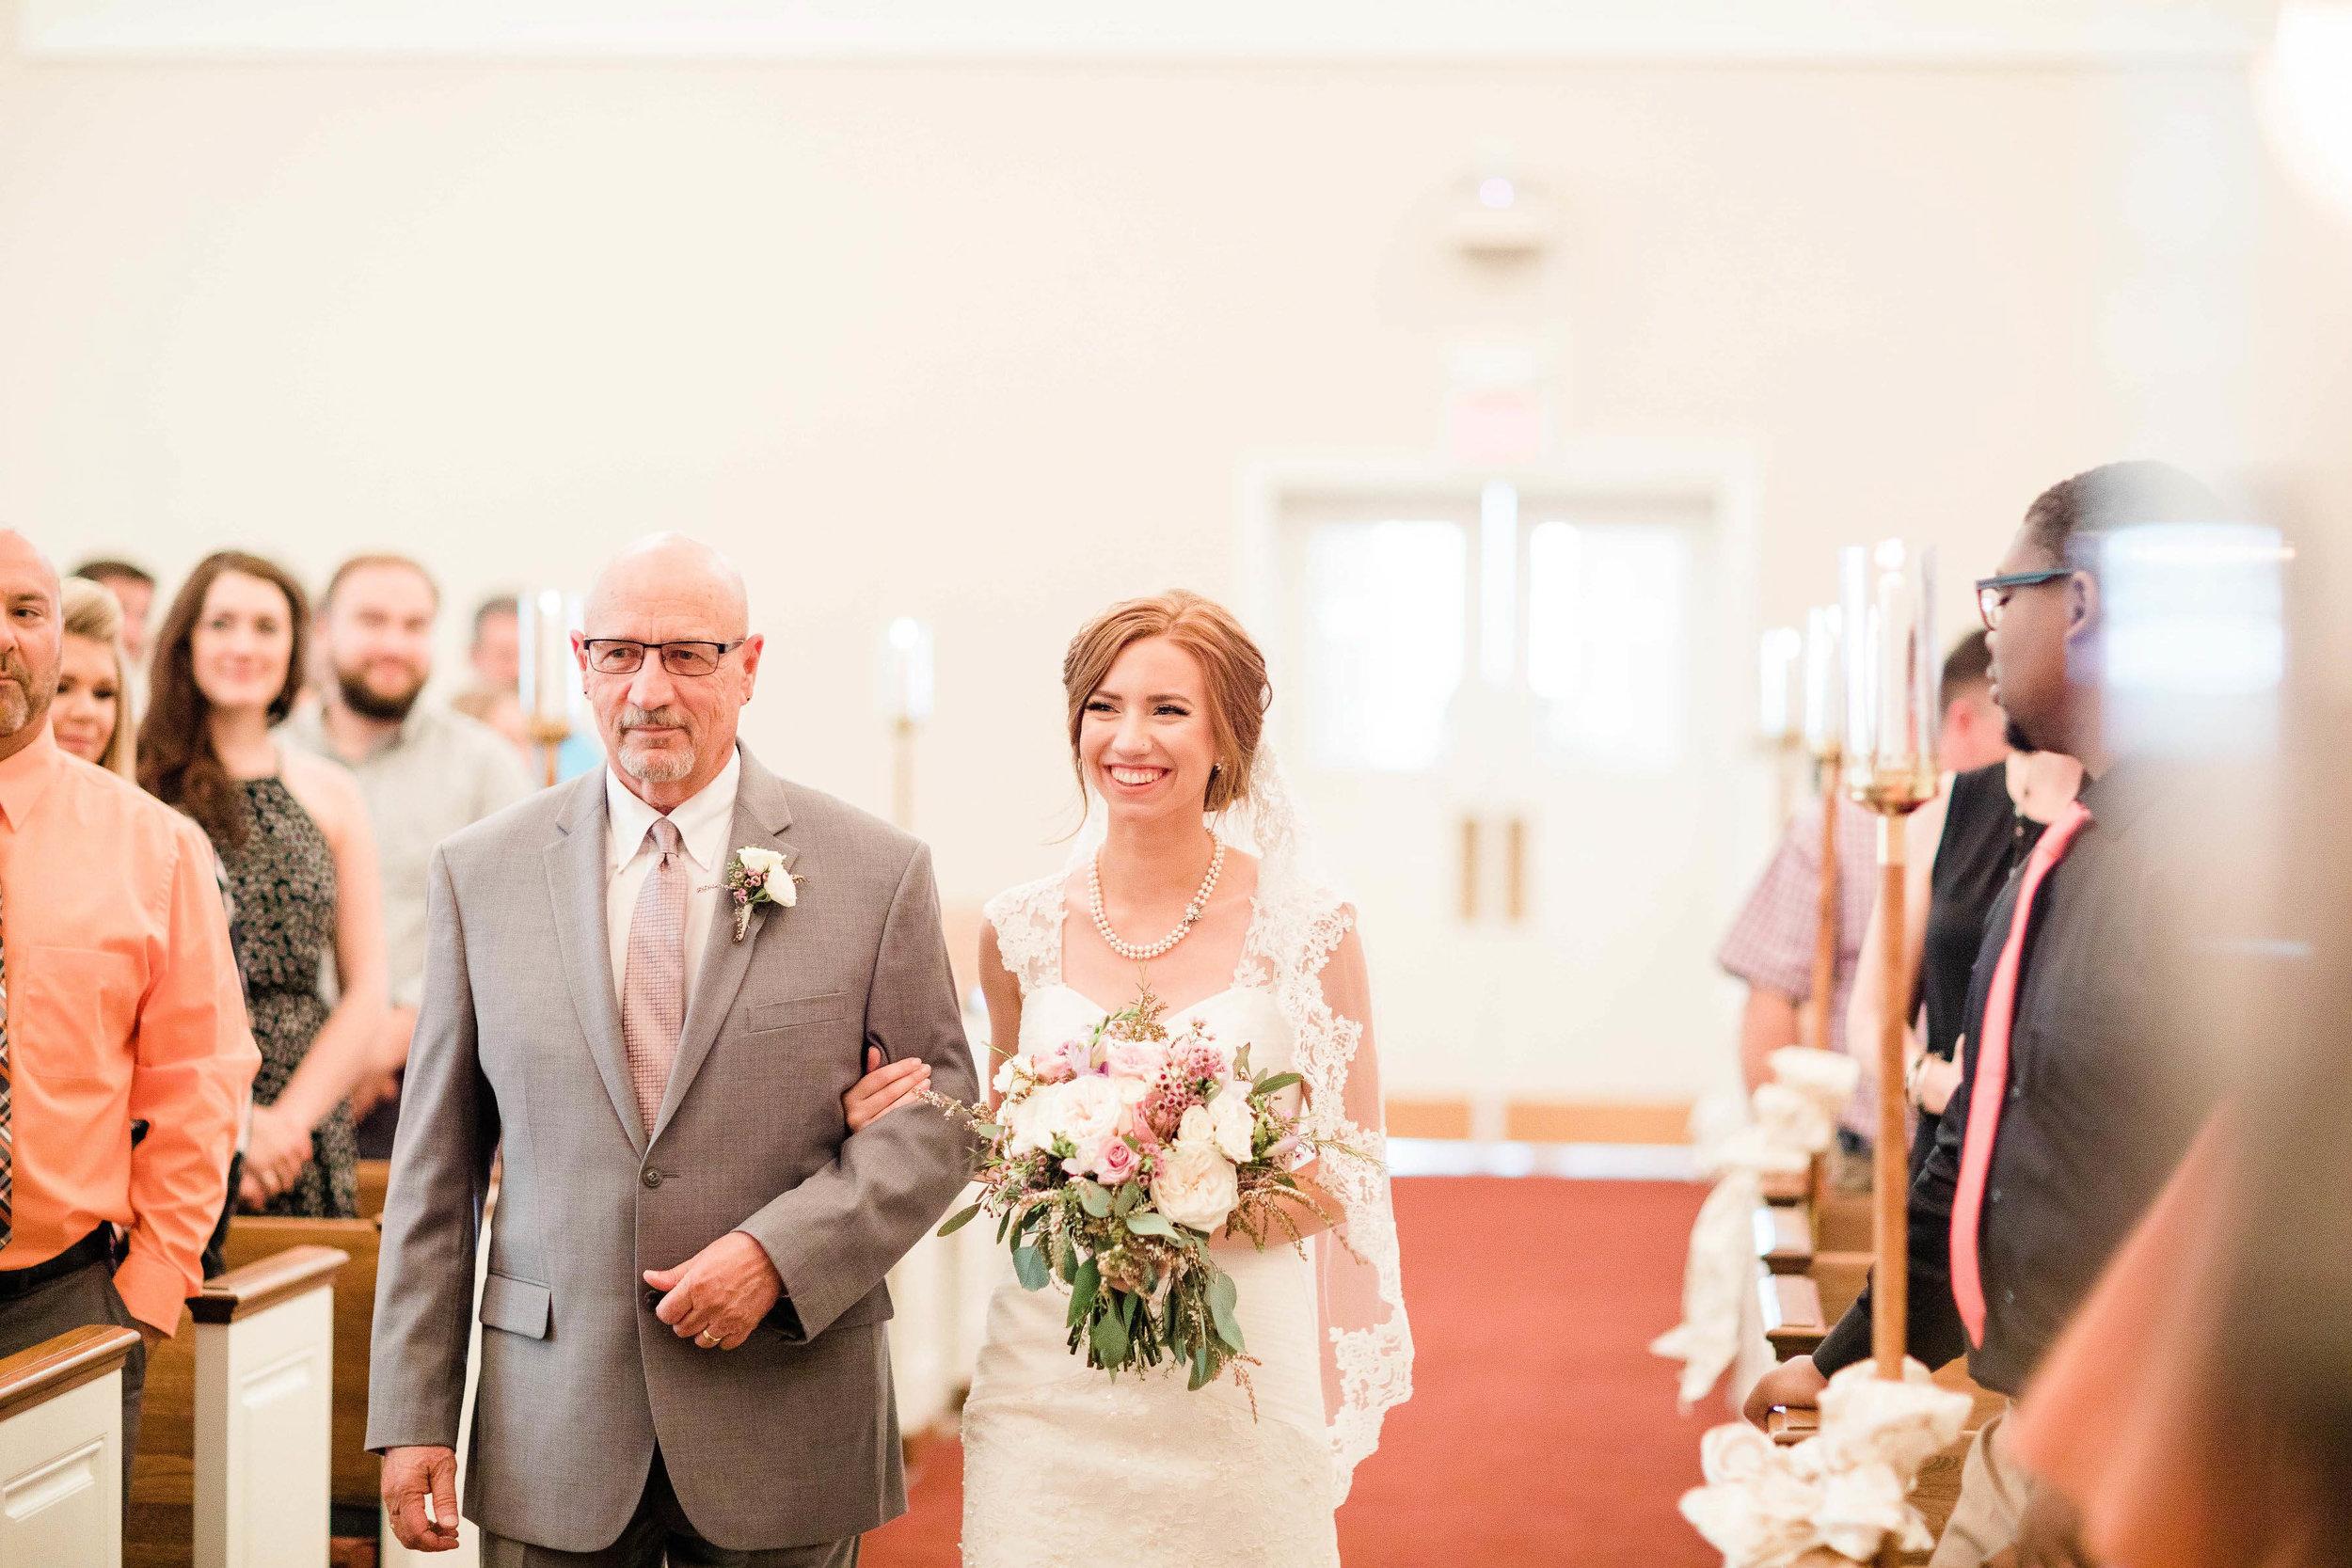 anderson hills united methodist church wedding cincinnati ohio-2.jpg